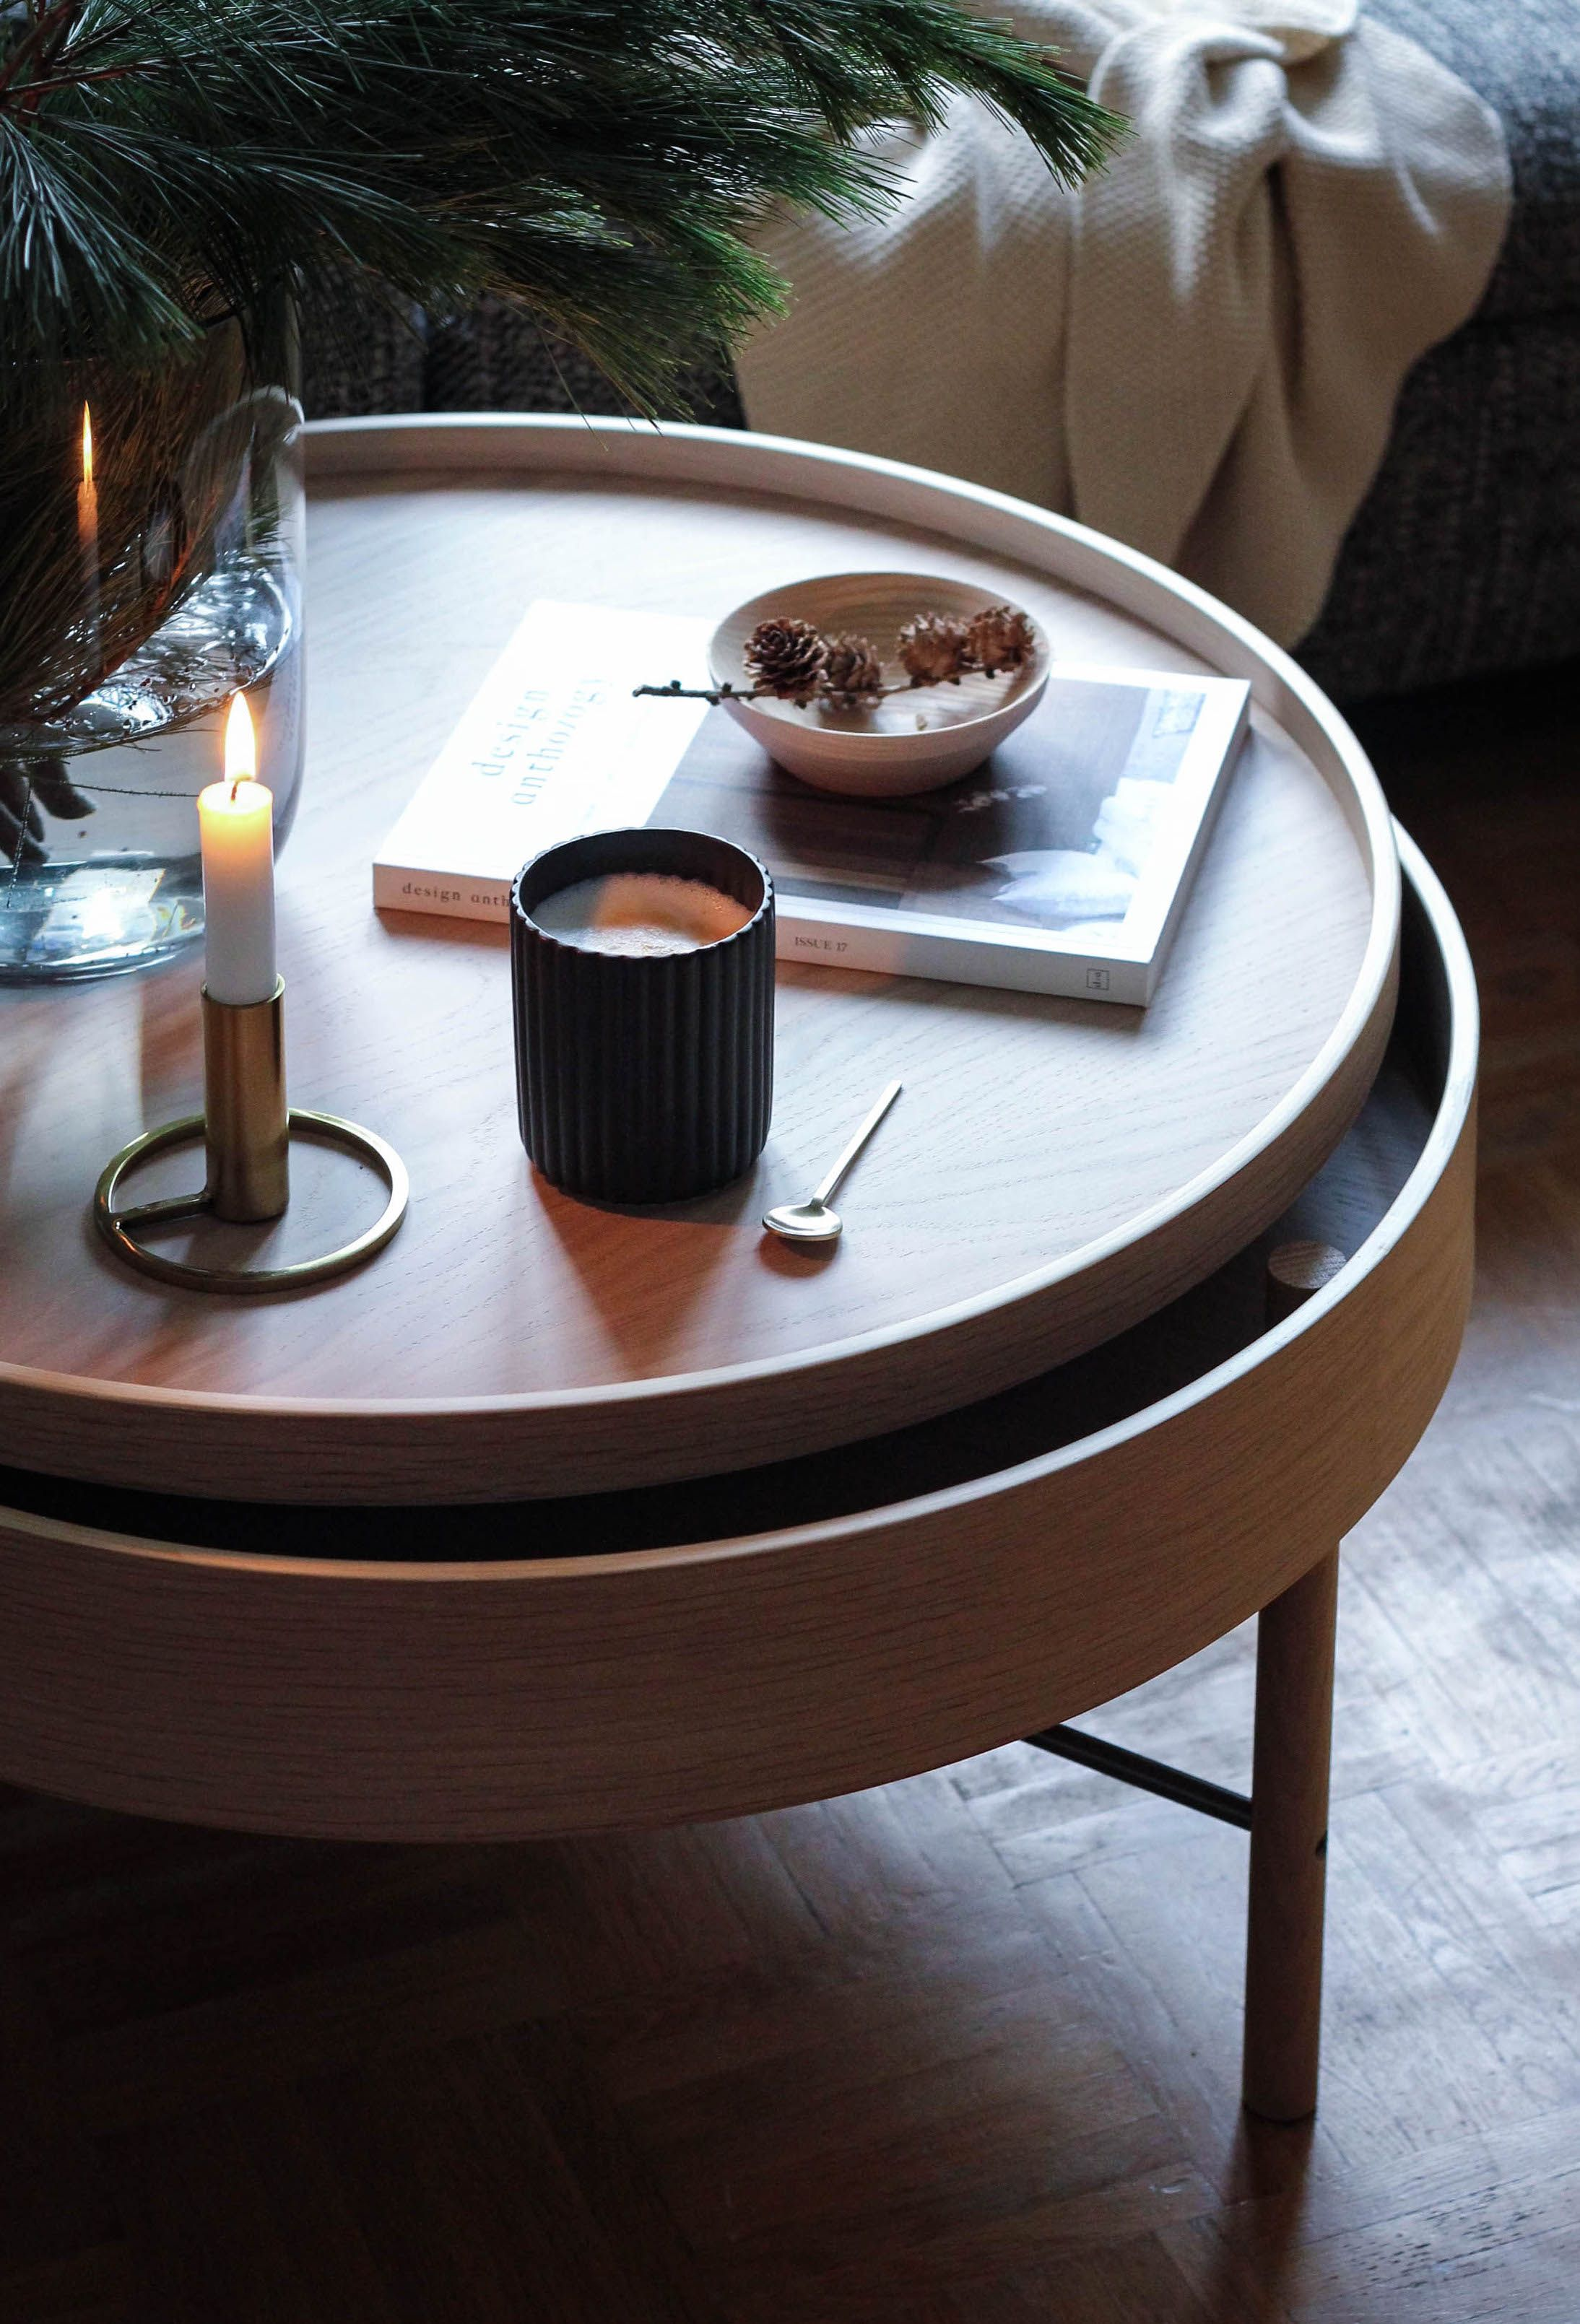 Turning Table Von Menu Im Wohndesign Shop Couchtisch Couchtisch Skandinavisch Couchtisch Stauraum